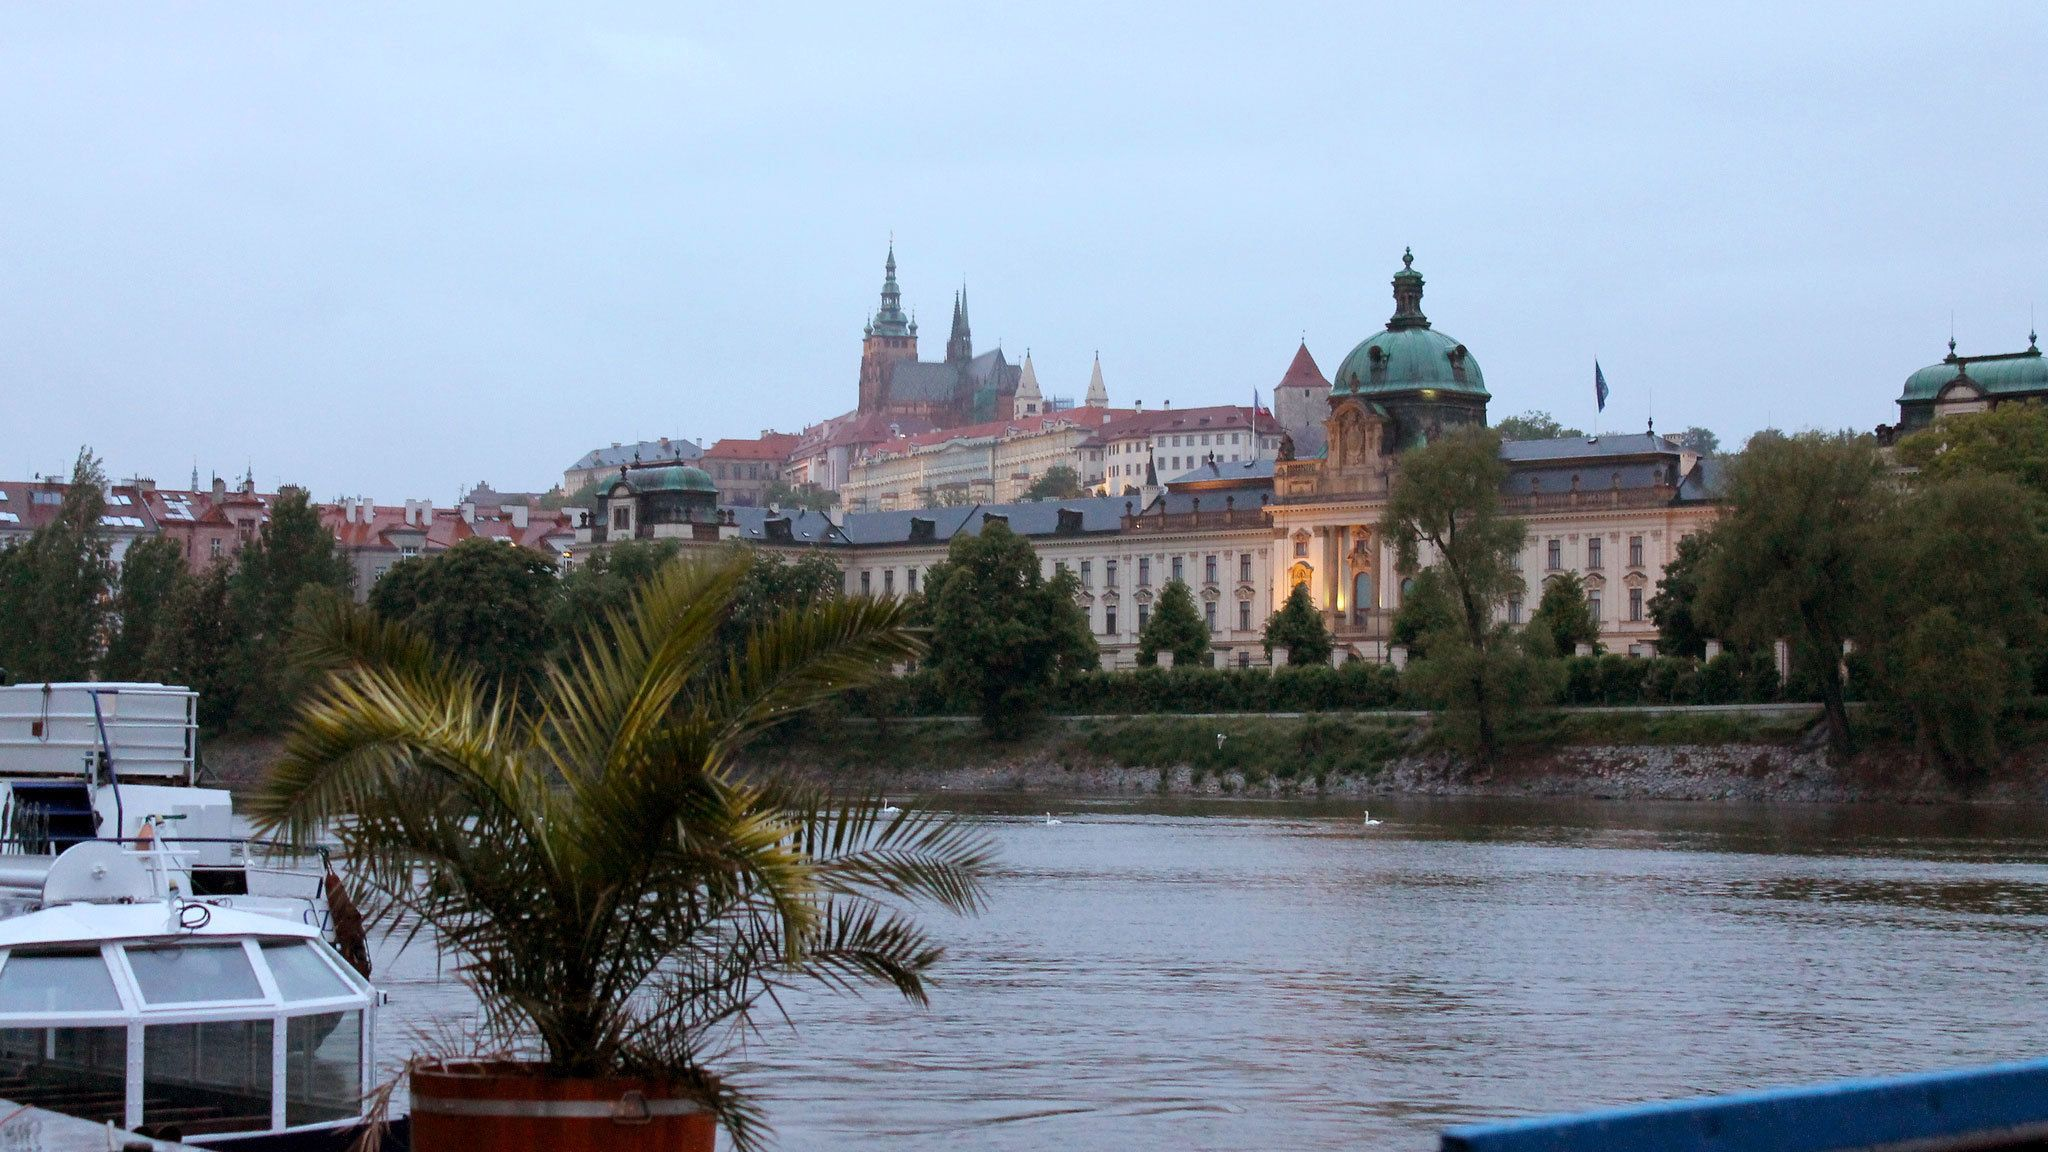 Looking across the Vltava Rivera at Old Town Prague